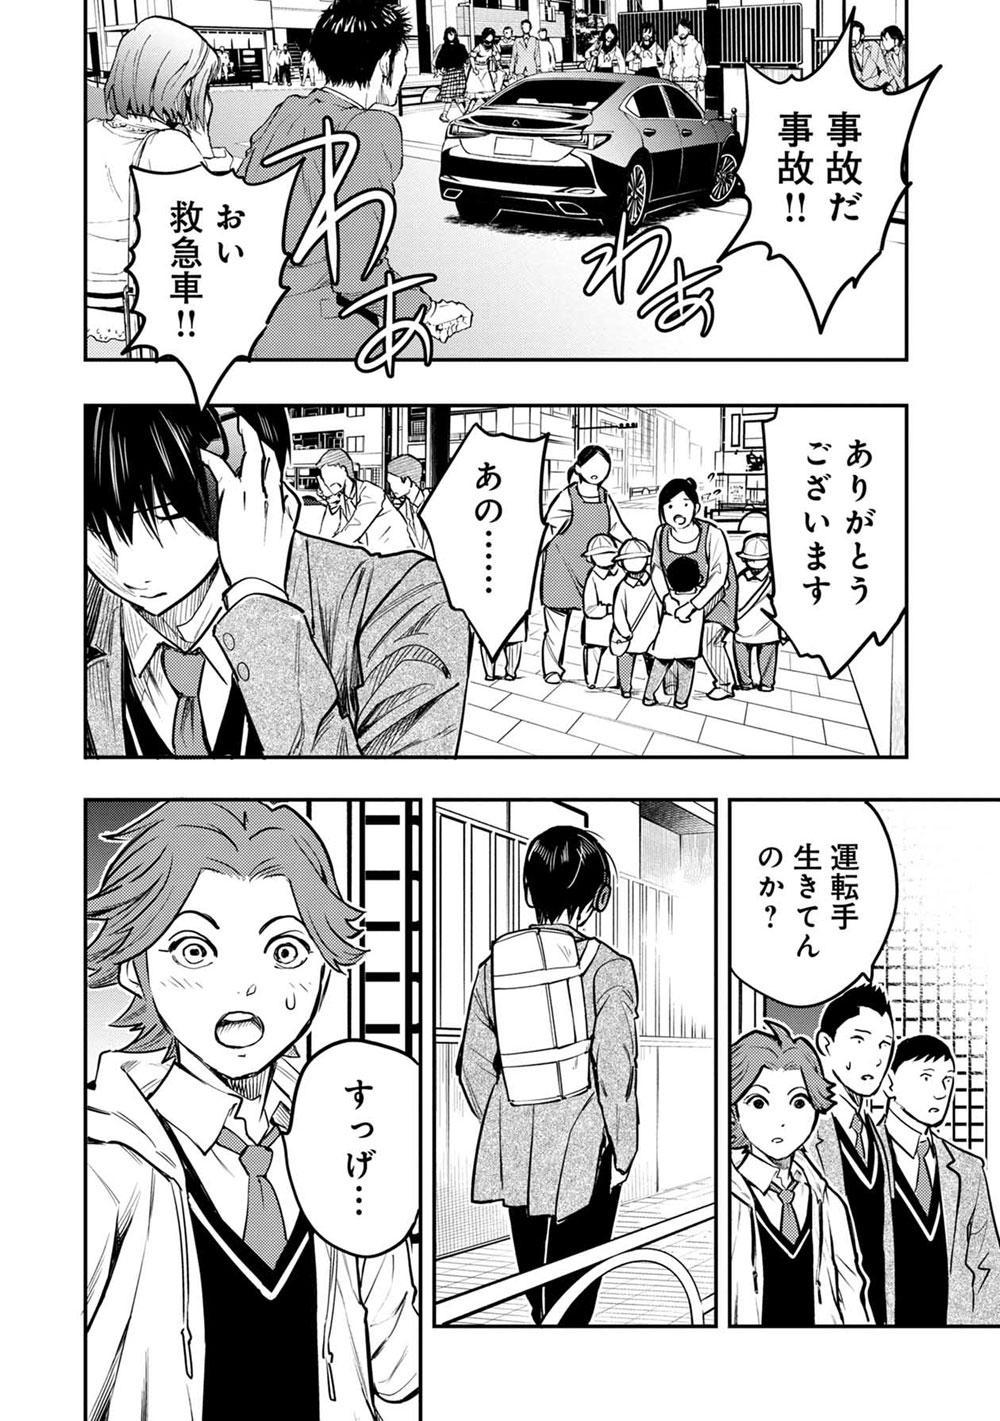 inugami_re_001_020.jpg